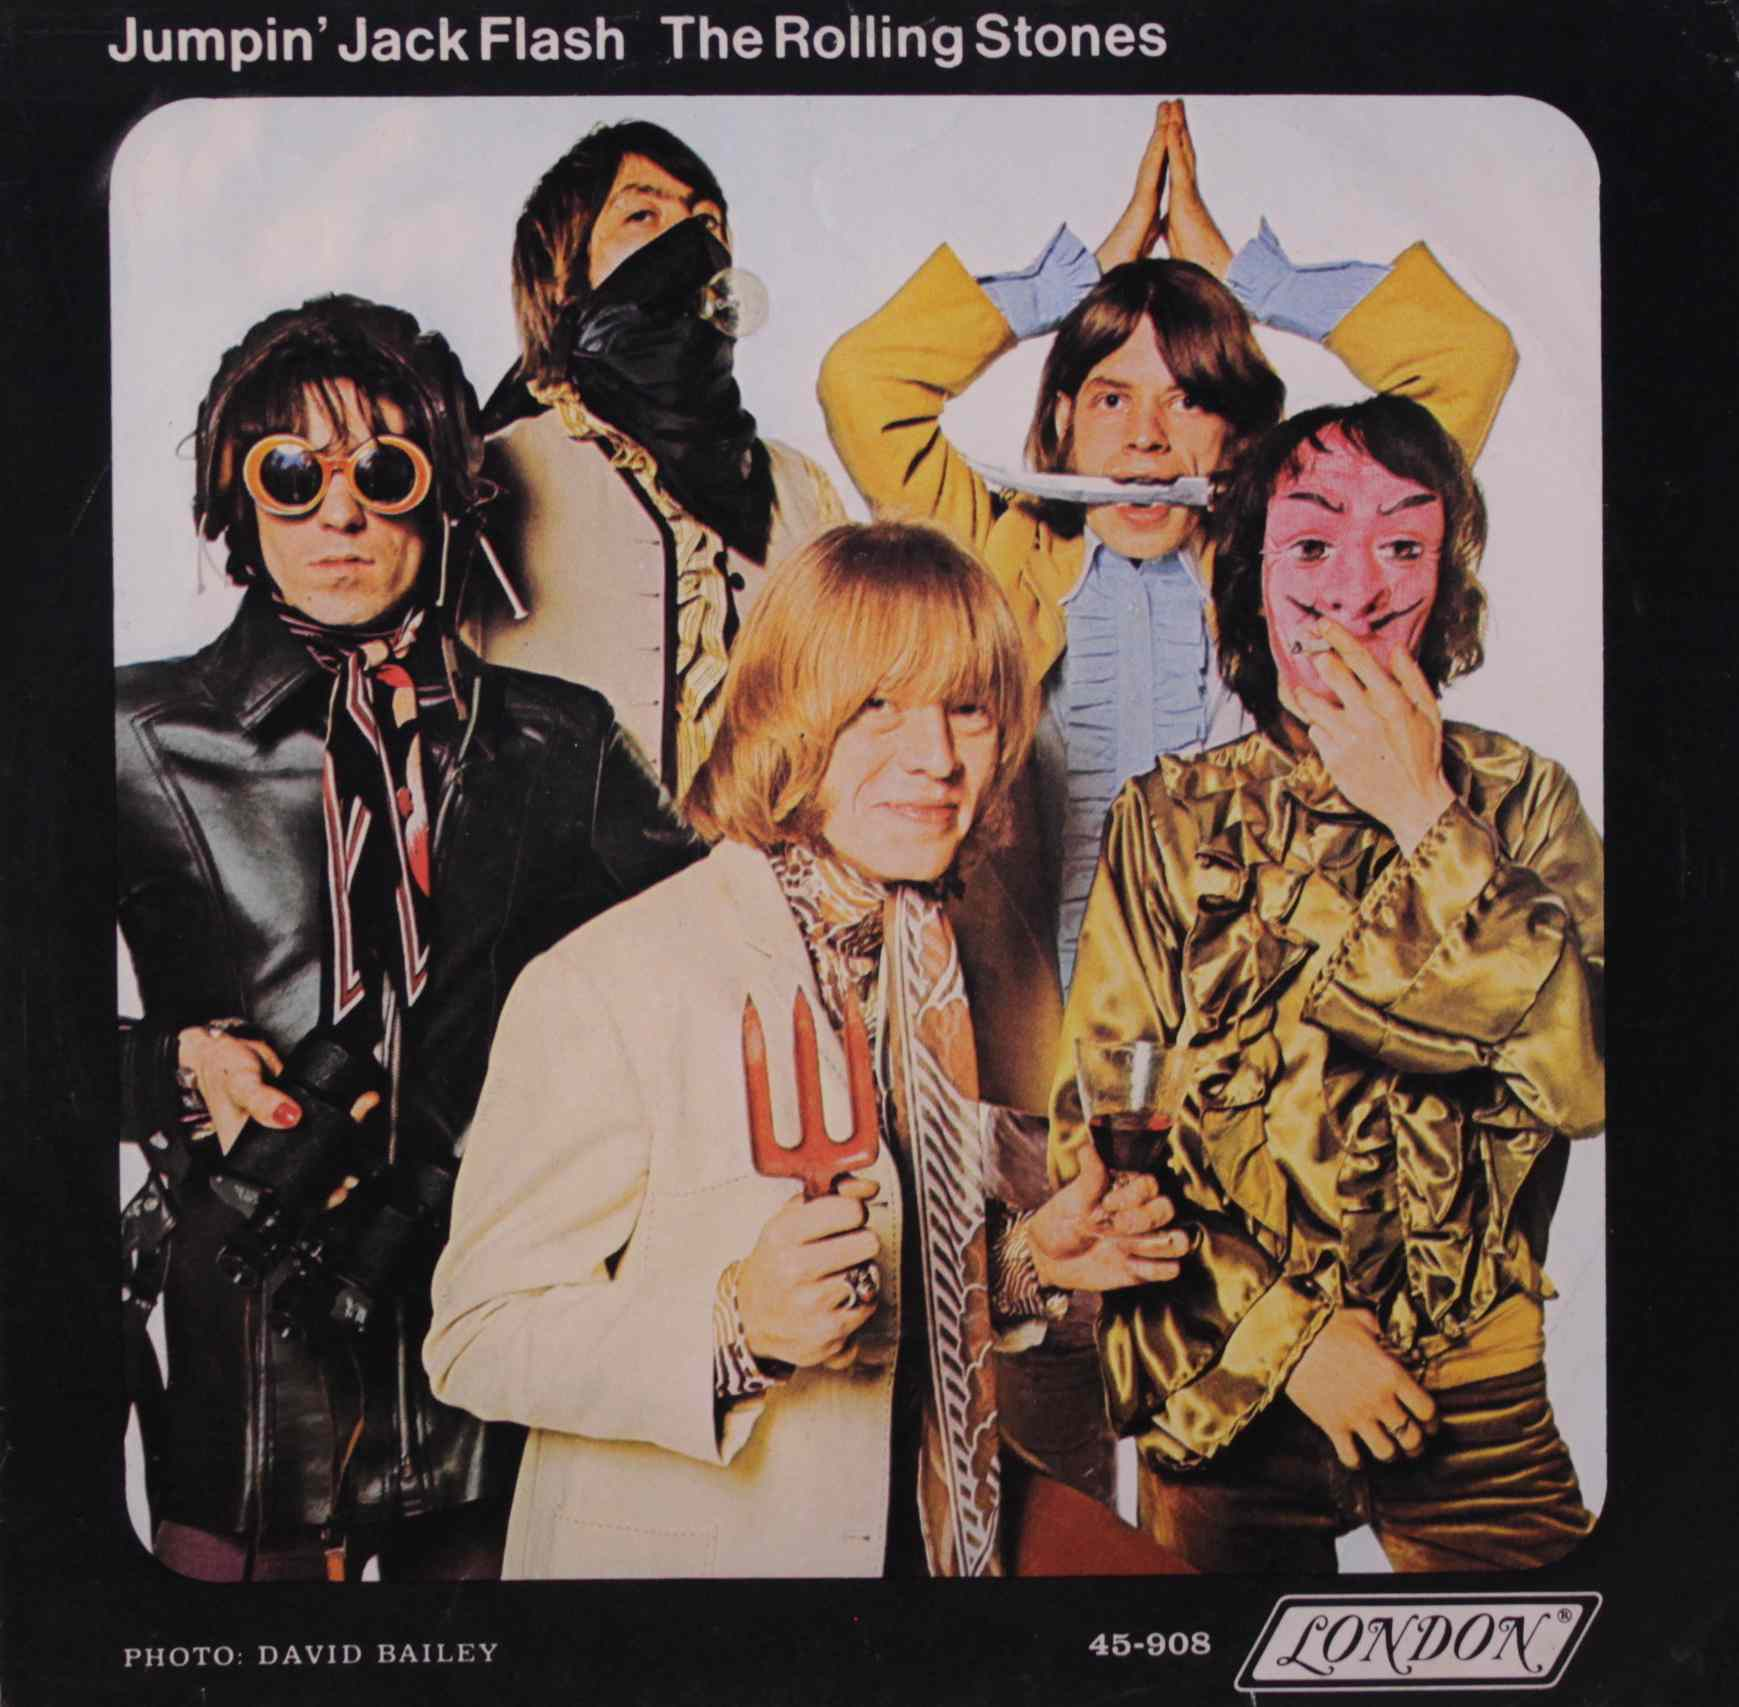 Rolling Stones Jumpin' Jack Flash